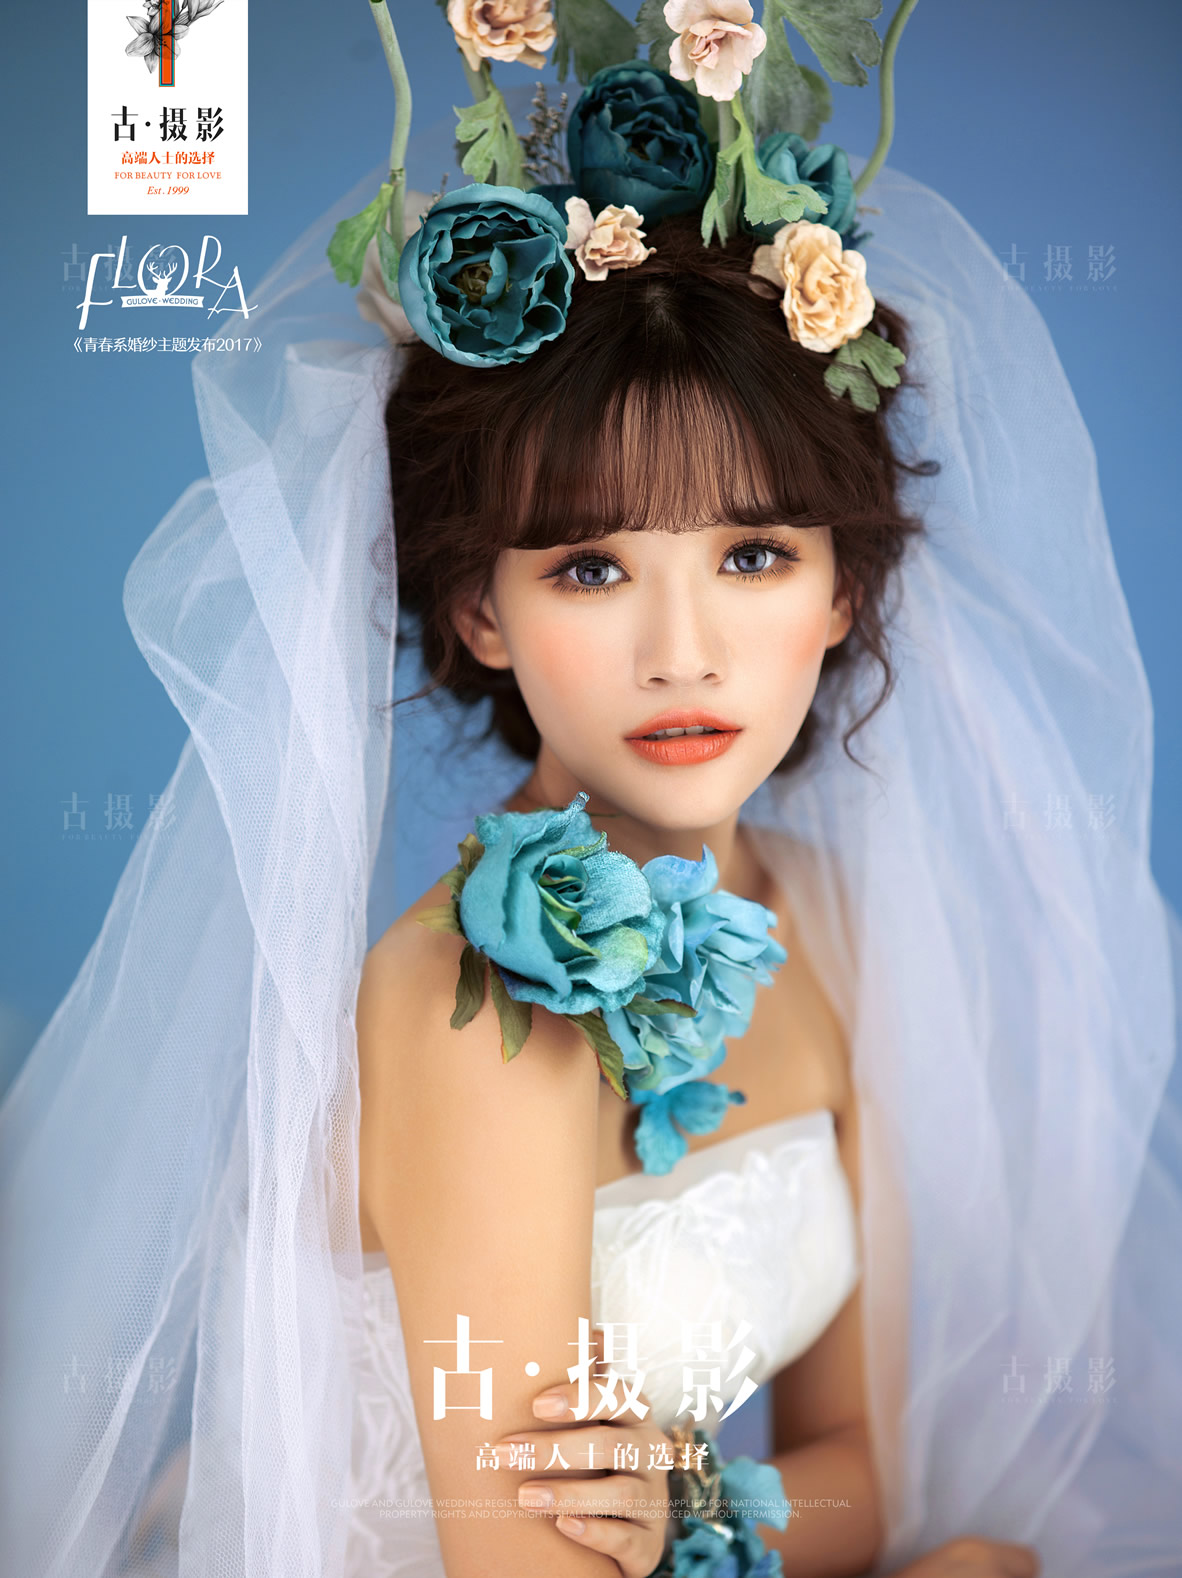 flowers Ⅱ - 明星范 - love上海古摄影-上海婚纱摄影网